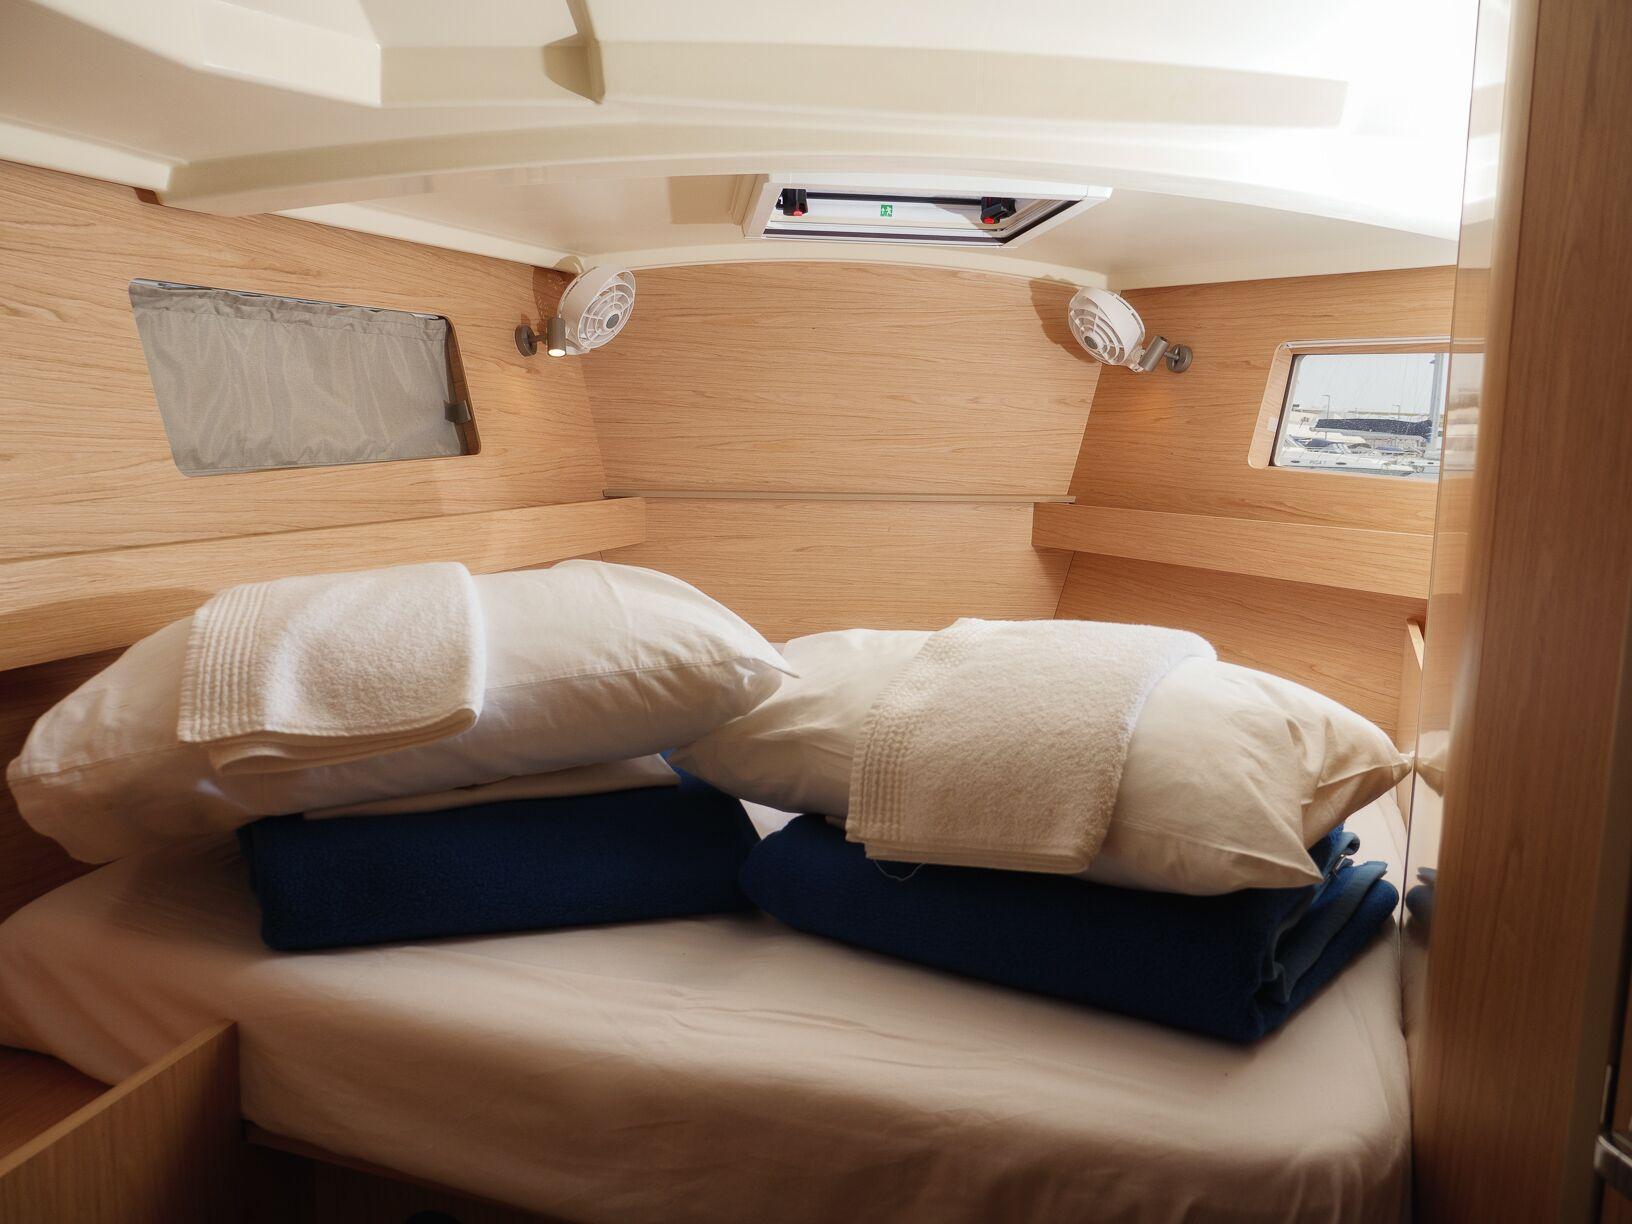 Oceanis 41.1 (GOA) Interior - cabin (photo taken 2019) - 6